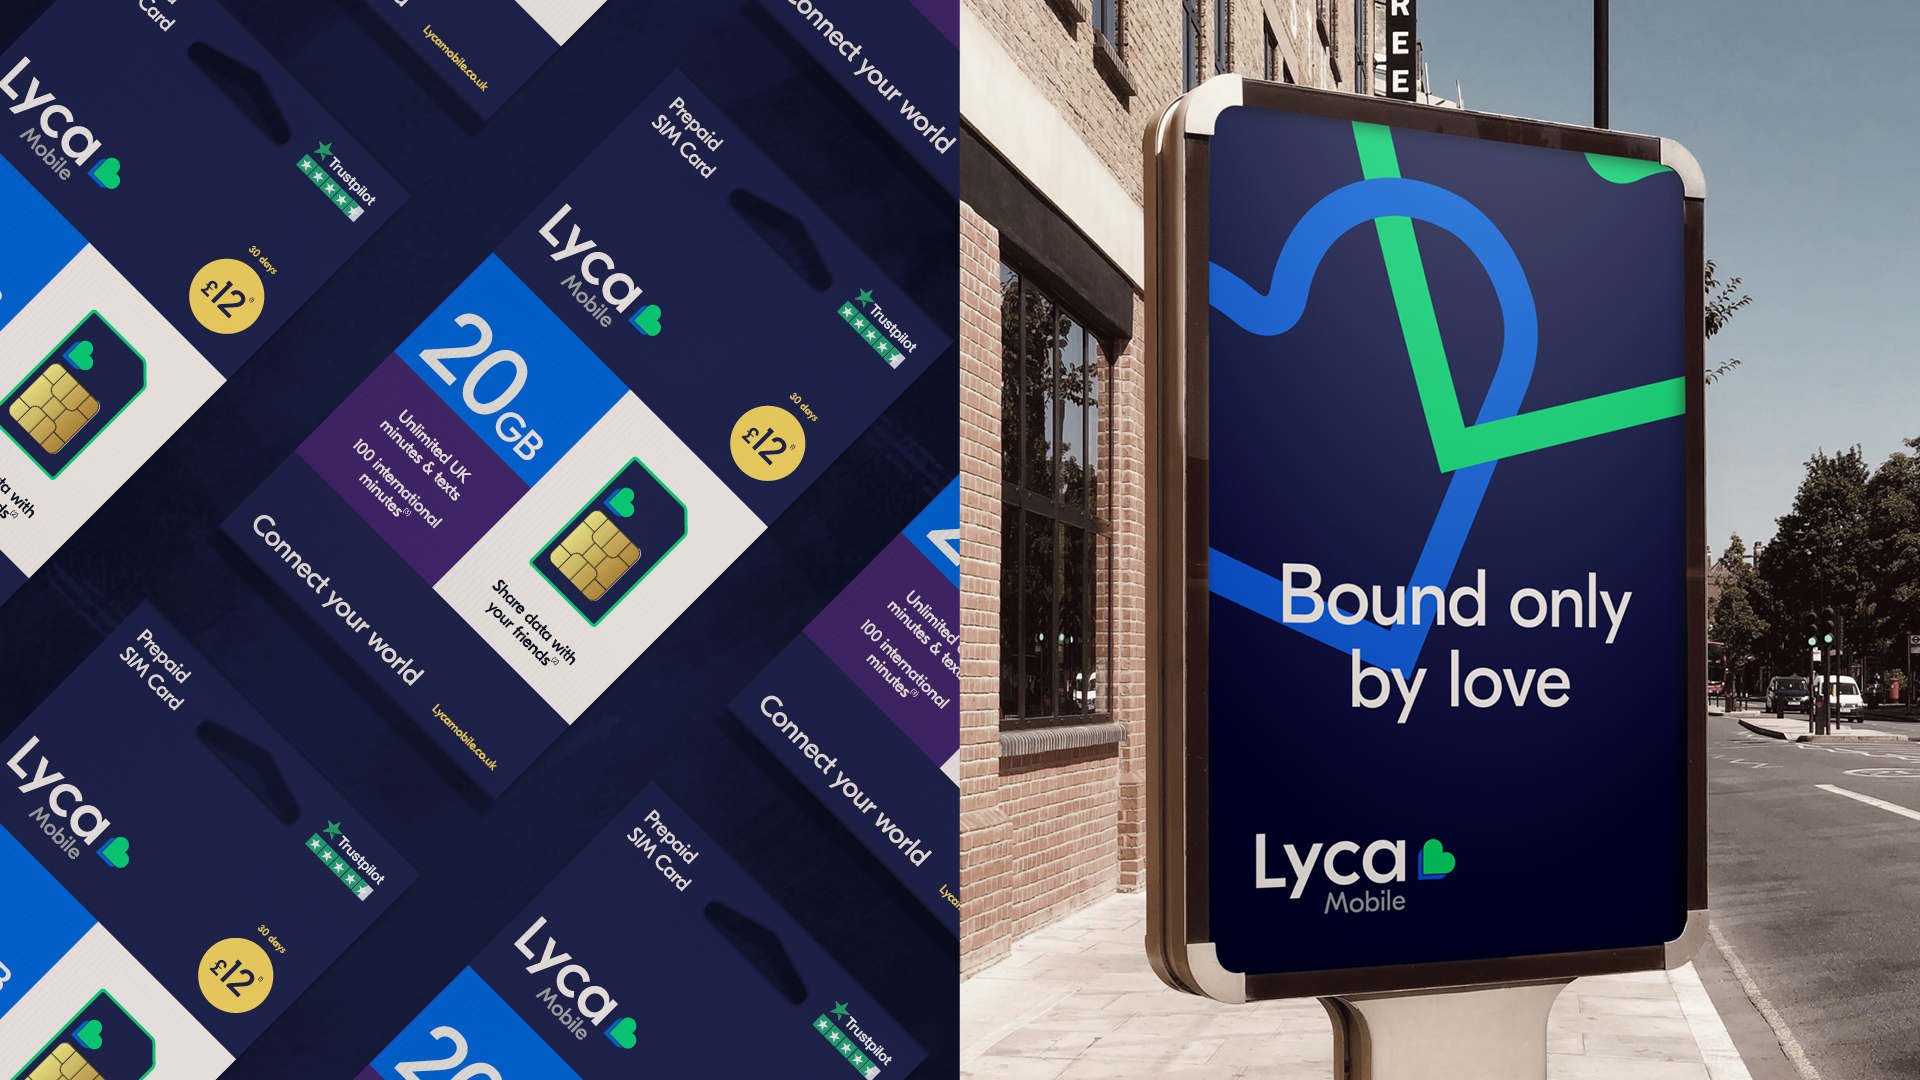 Lyca Mobile Sim packaging and digital billboard